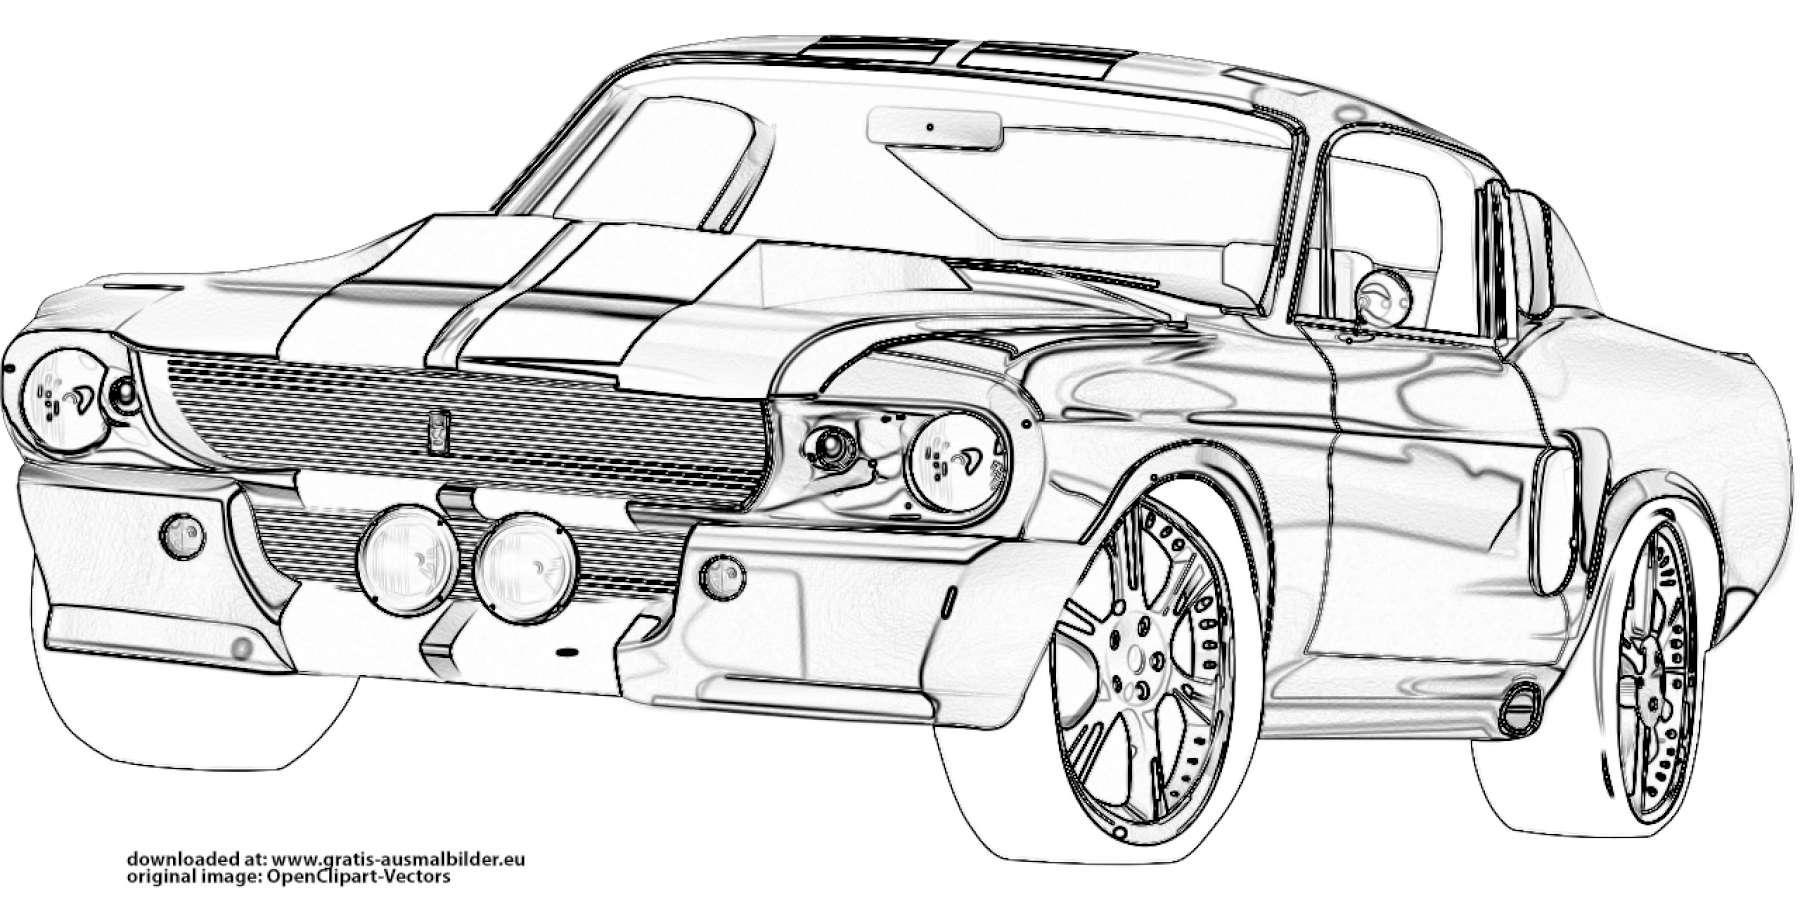 Ford Mustang Gratis Ausmalbild